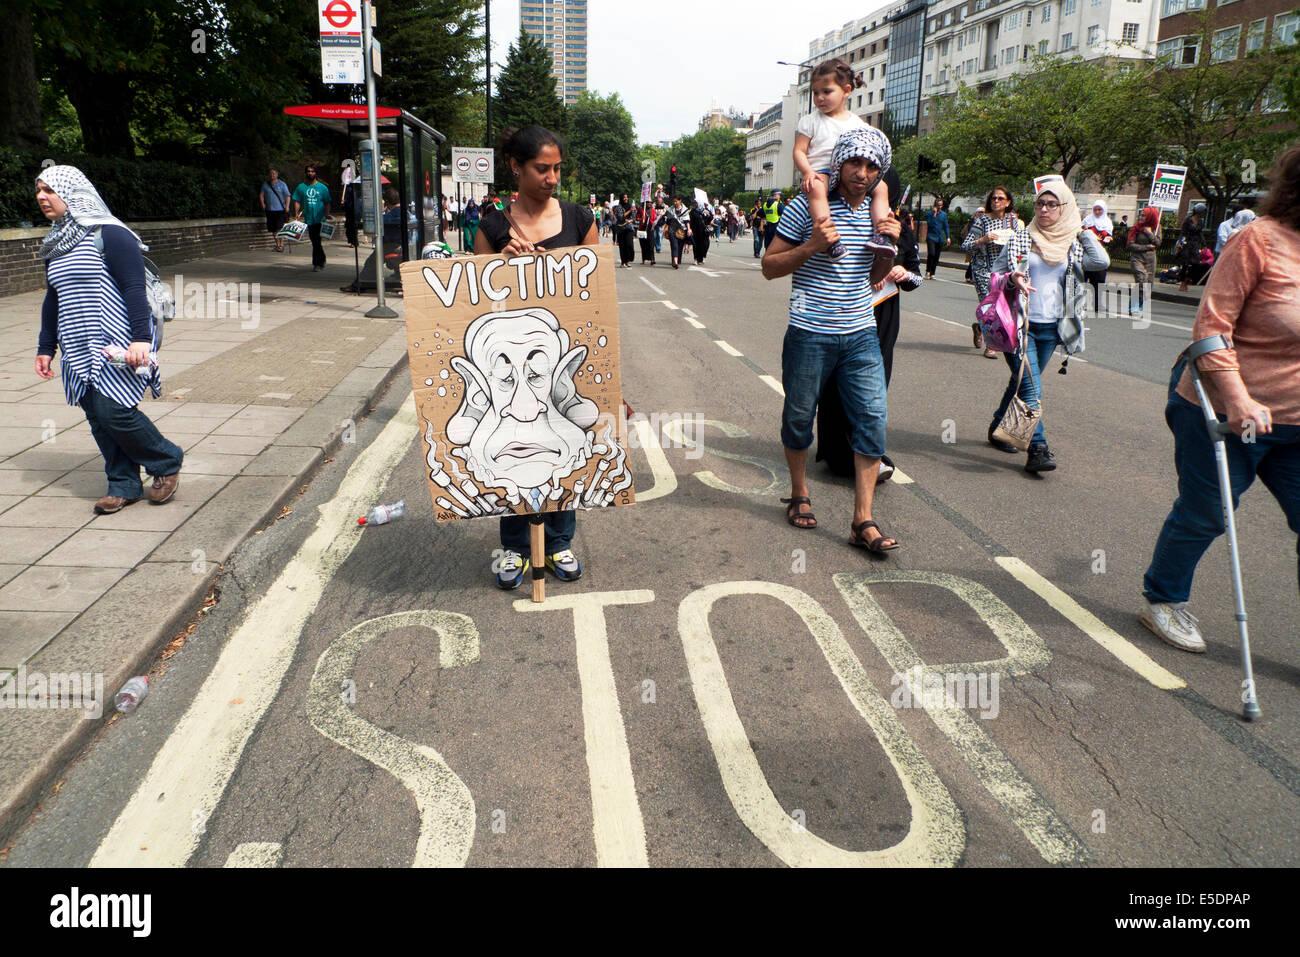 A Palestinian woman holding a Benjamin Netanyahu placard at Palestine Anti War Demonstration London 19th July 2014 - Stock Image